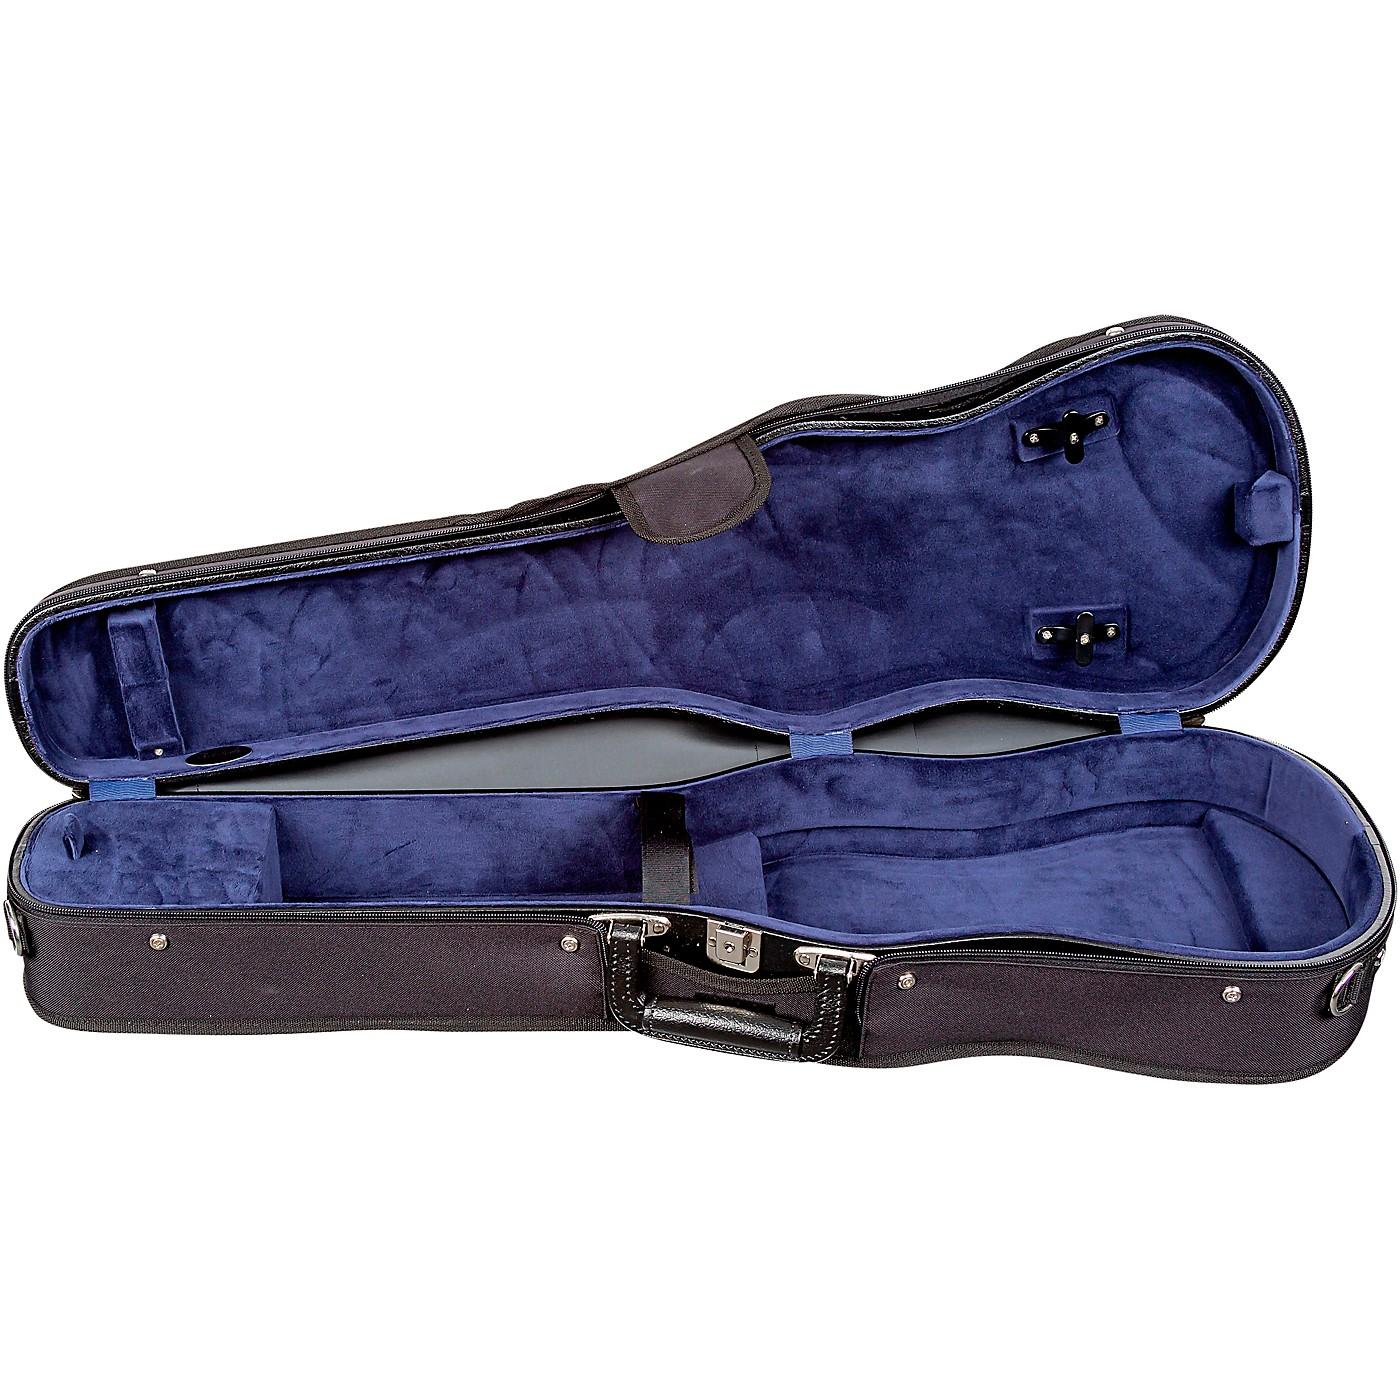 Bobelock Slim Shaped Woodshell Suspension Violin Case thumbnail